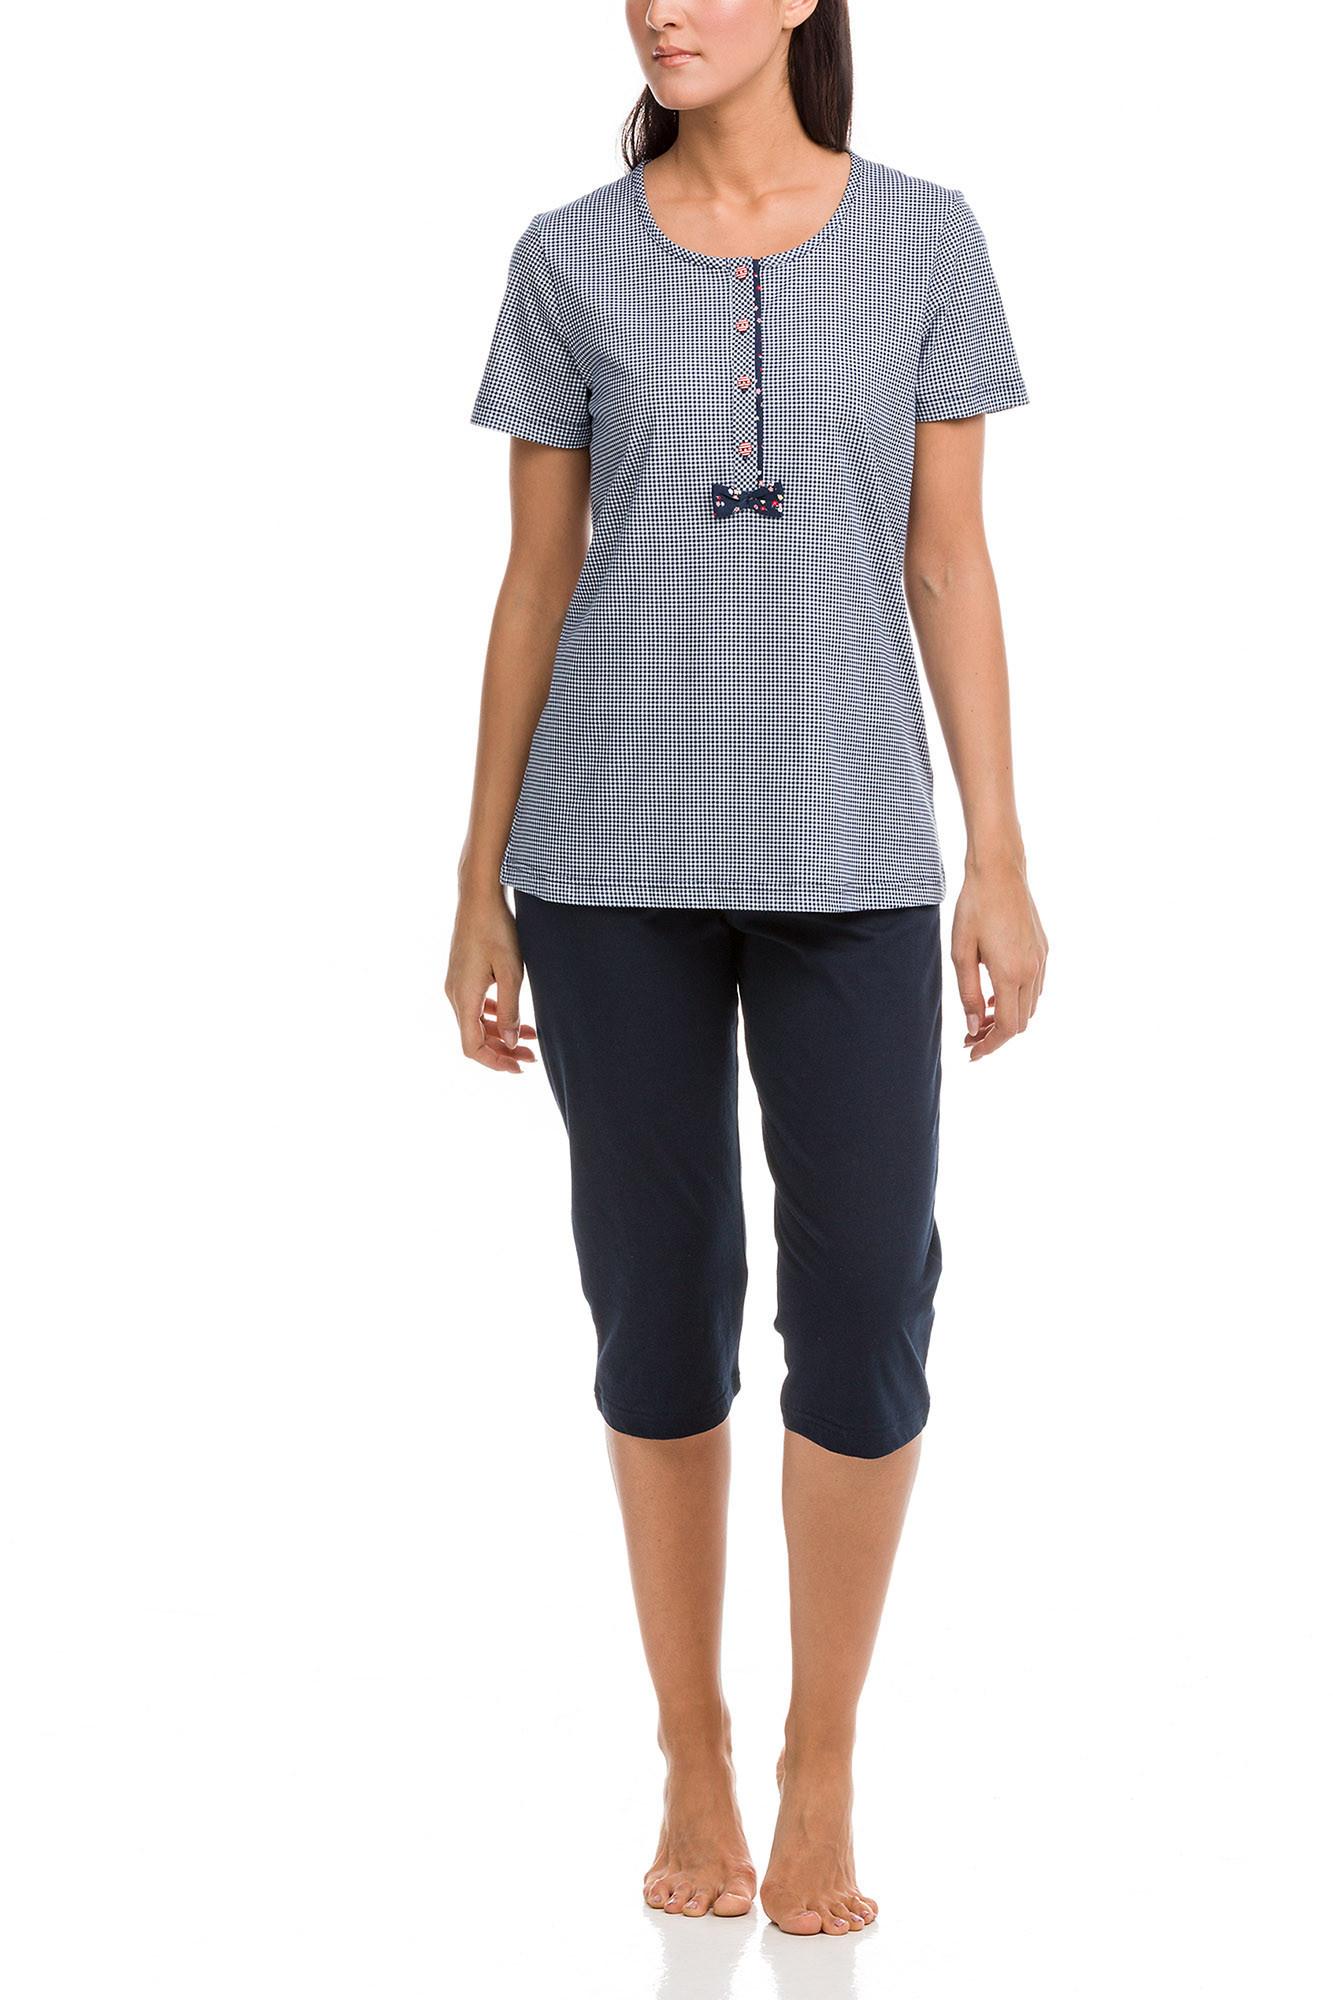 Vamp - Dámske pyžamo 12410 - Vamp blue xl